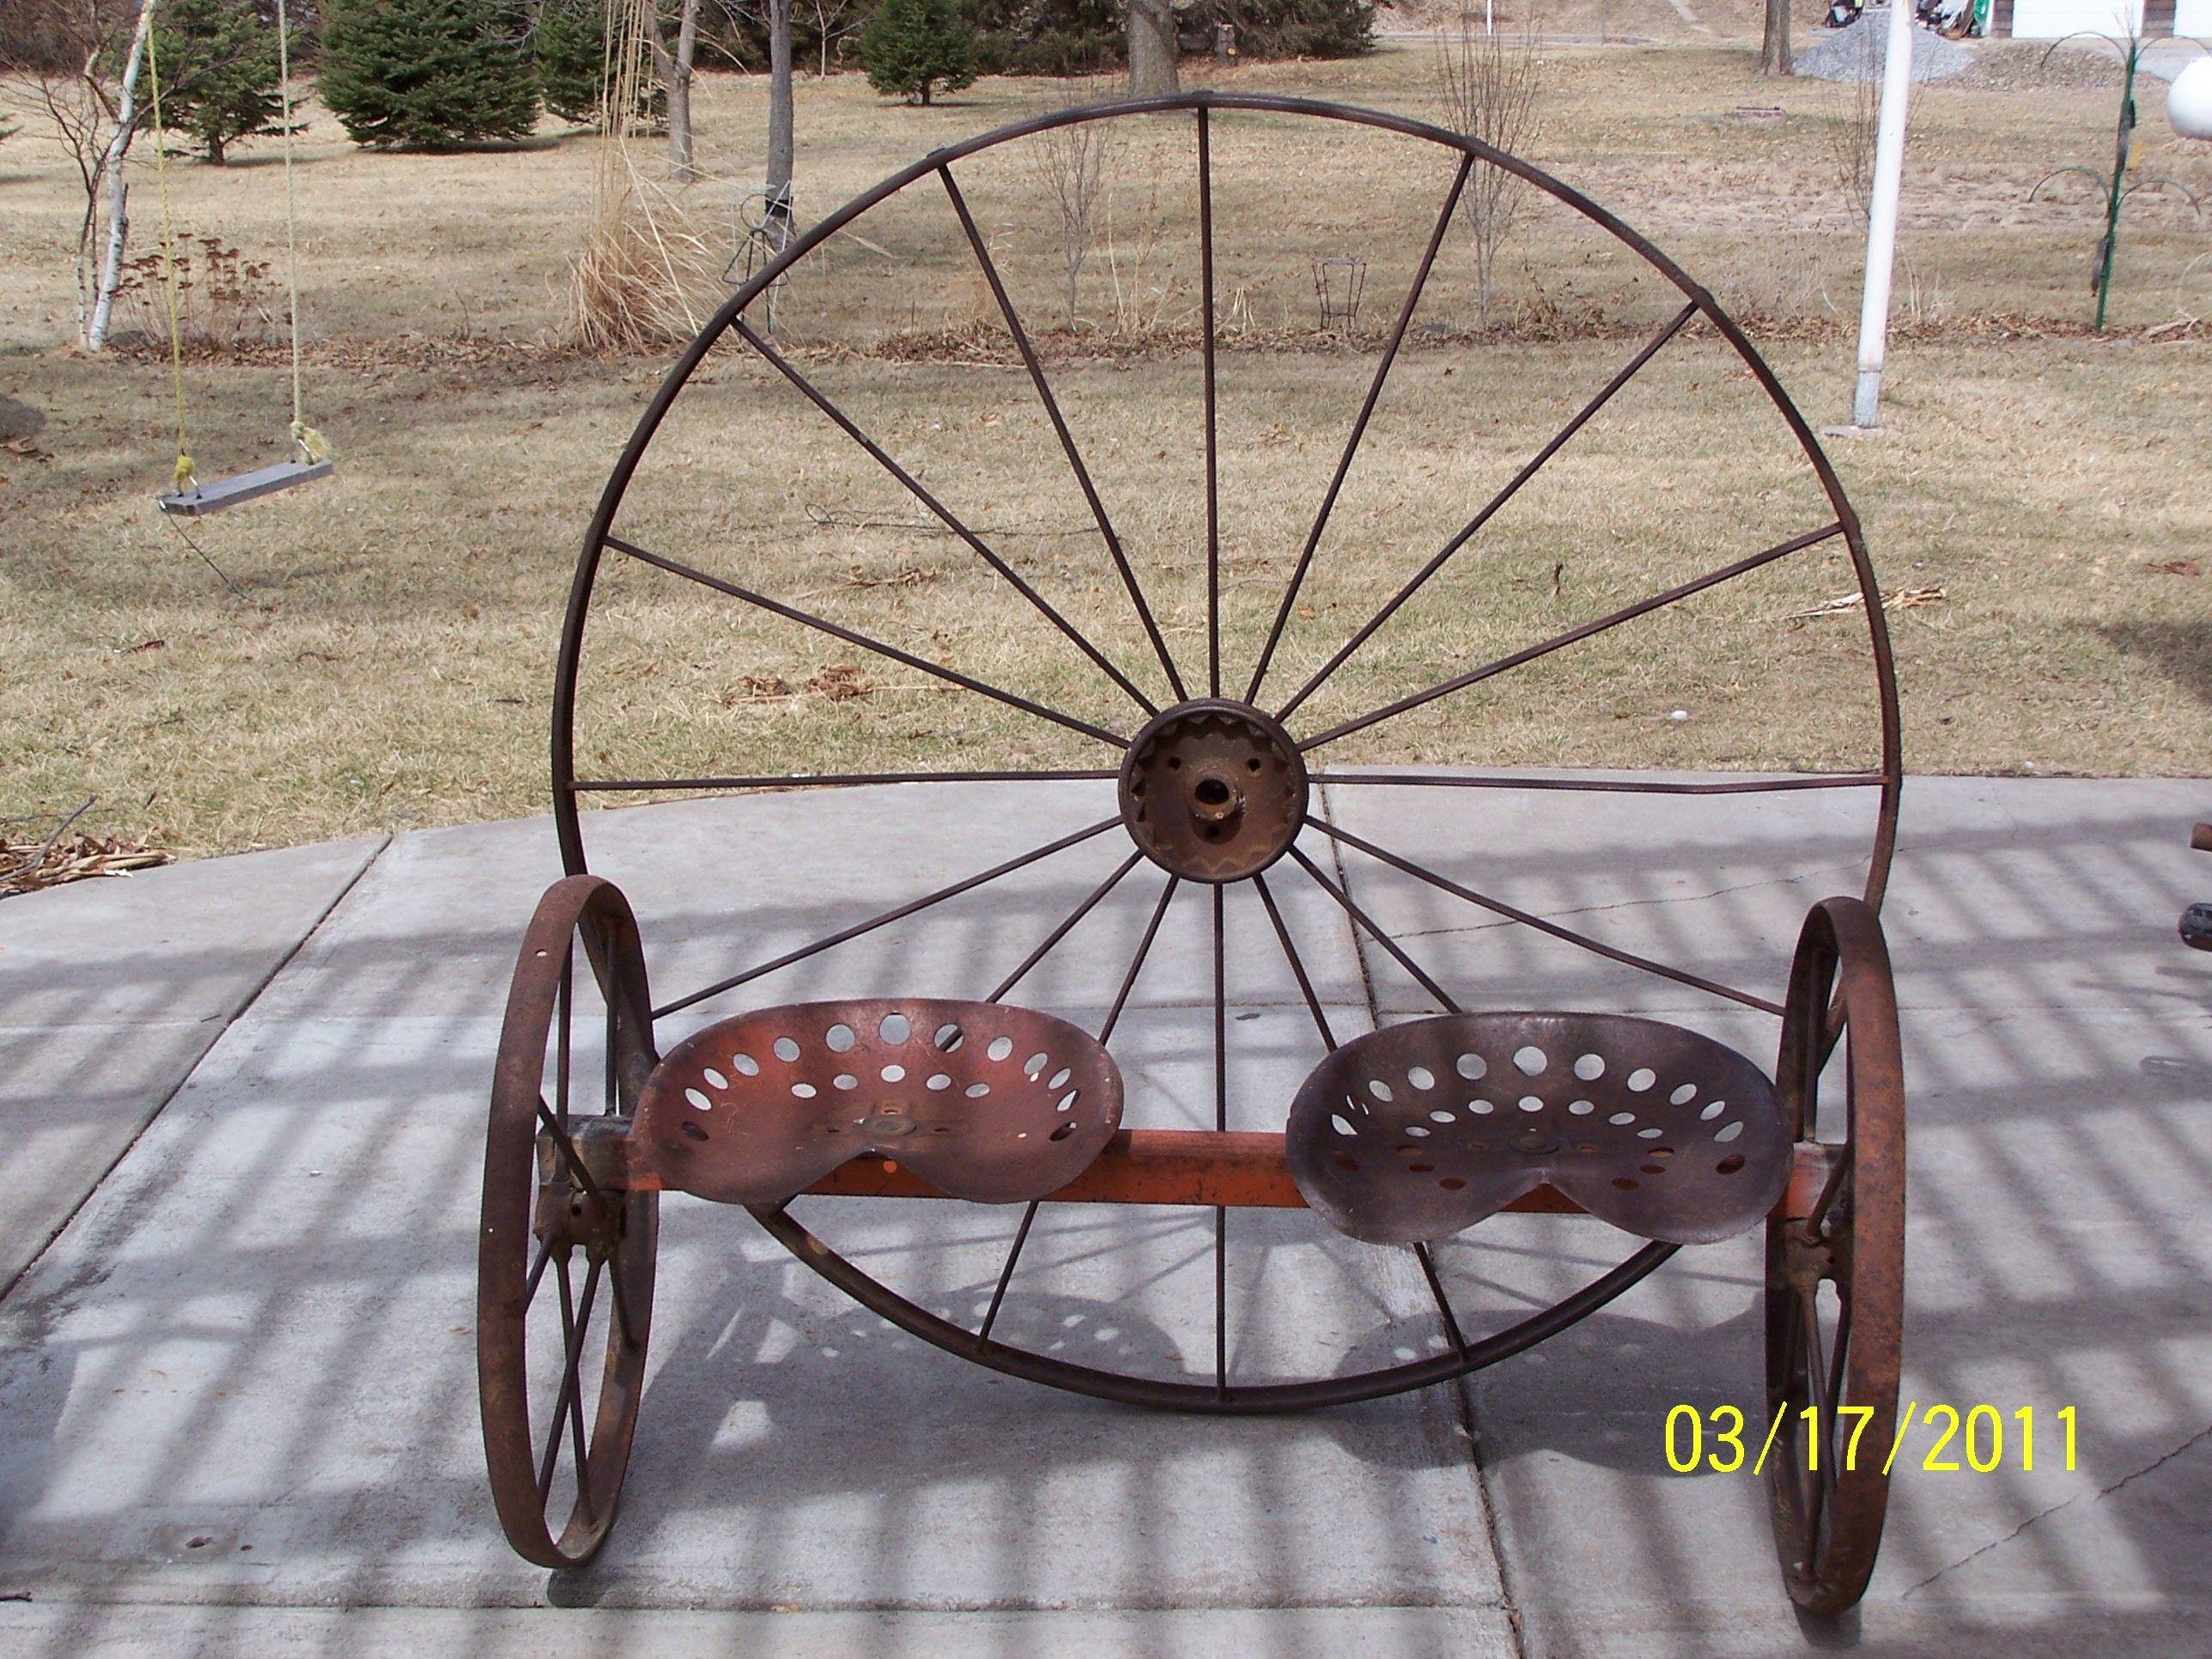 Antique Wagon Wheel Tractor Seat Garden Bench Metal Furniture Pinterest Gardens Heart